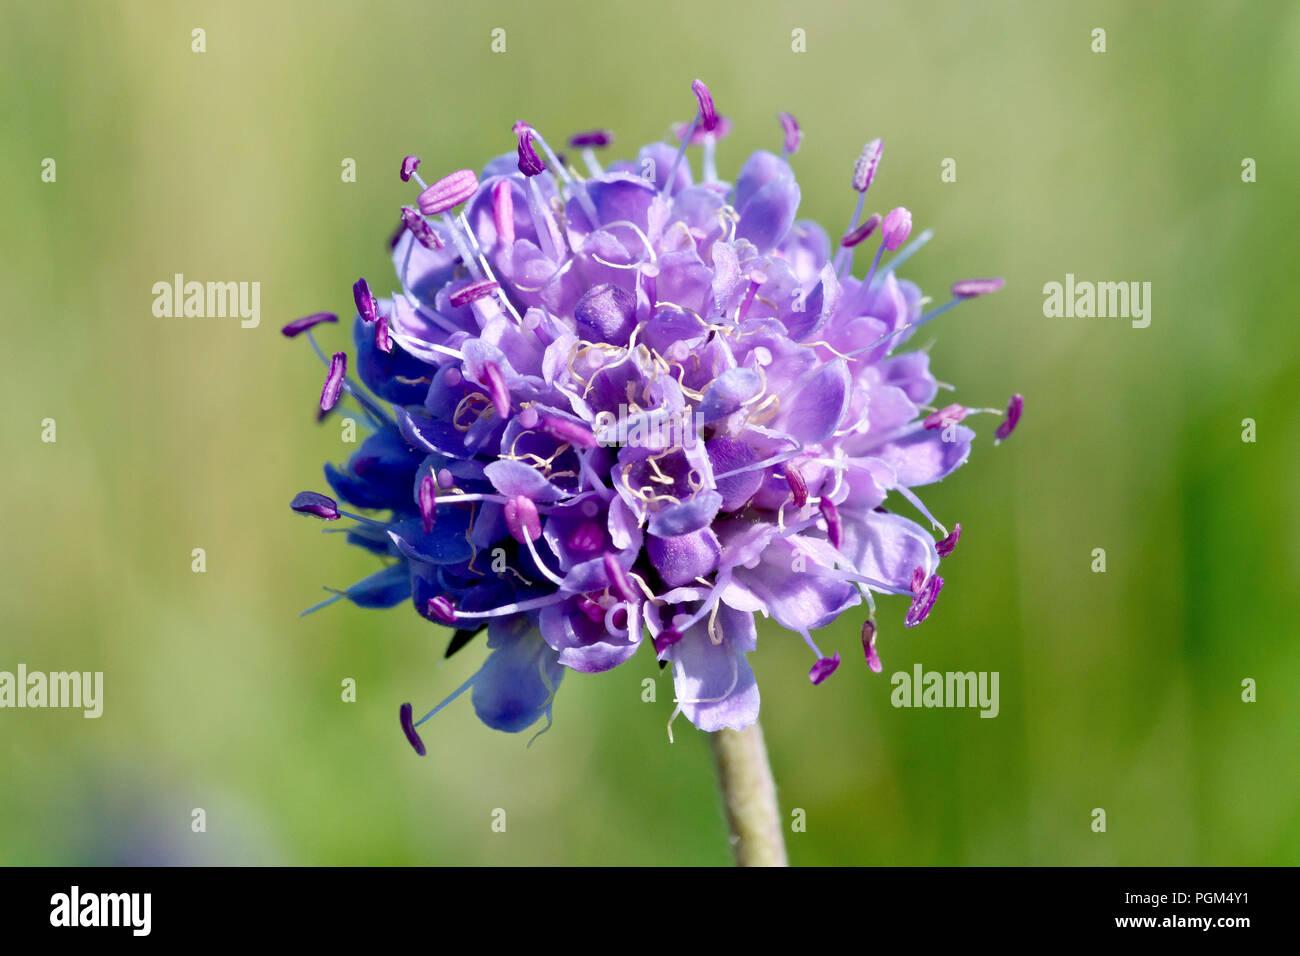 Devil's-bit Scabious (succisa pratensis), close up of a single flower head. - Stock Image